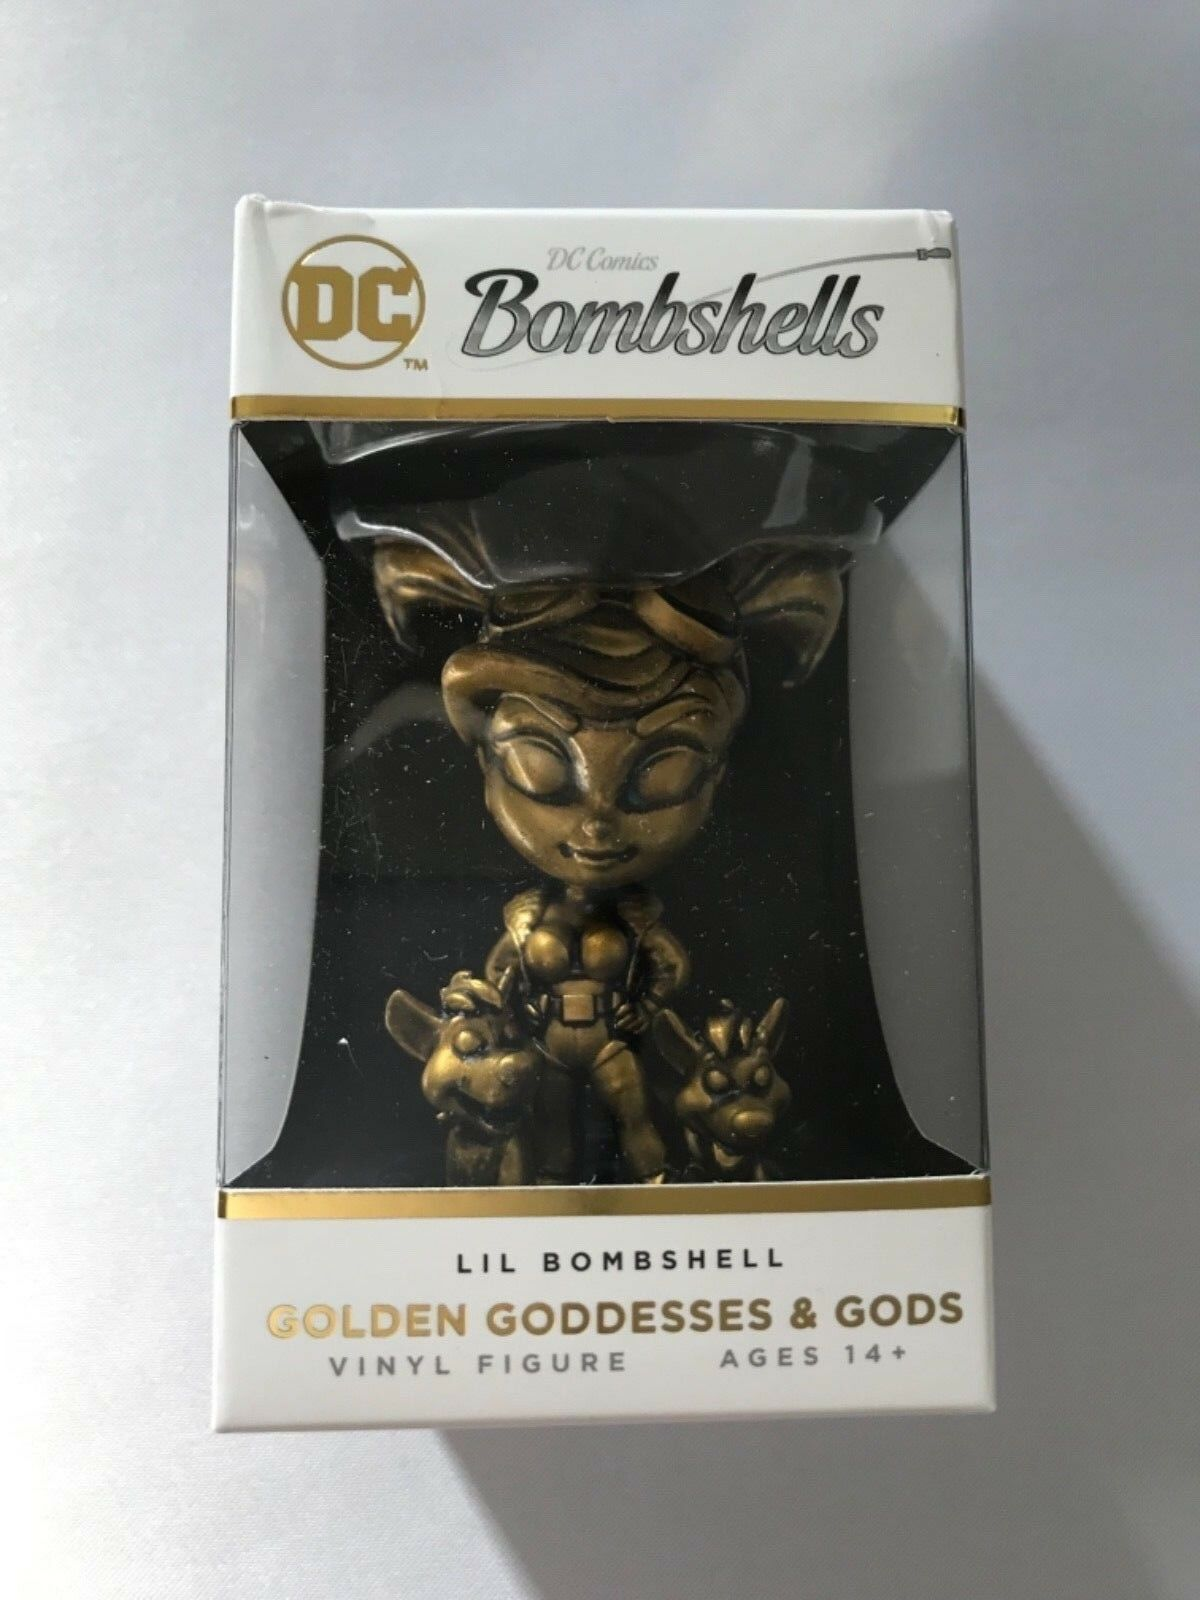 Dc comics bombshells 2, harley quinn bronze lil bomshells vinyl - figur